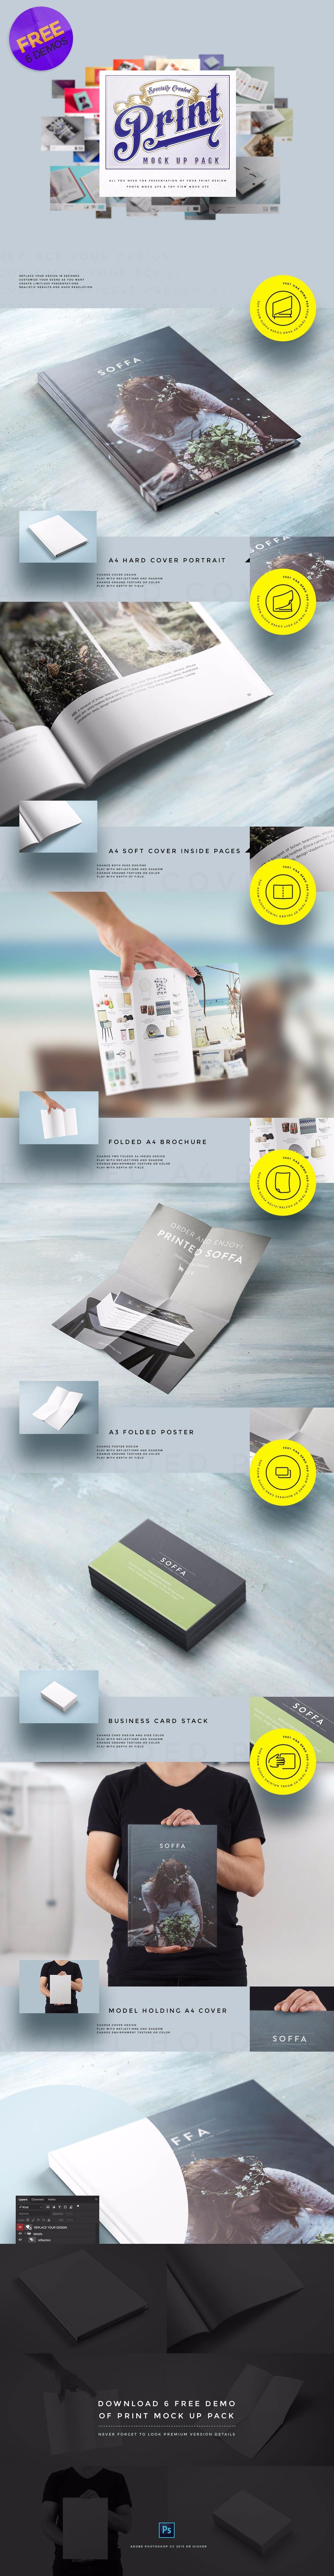 Free Print Mockup Pack PSD